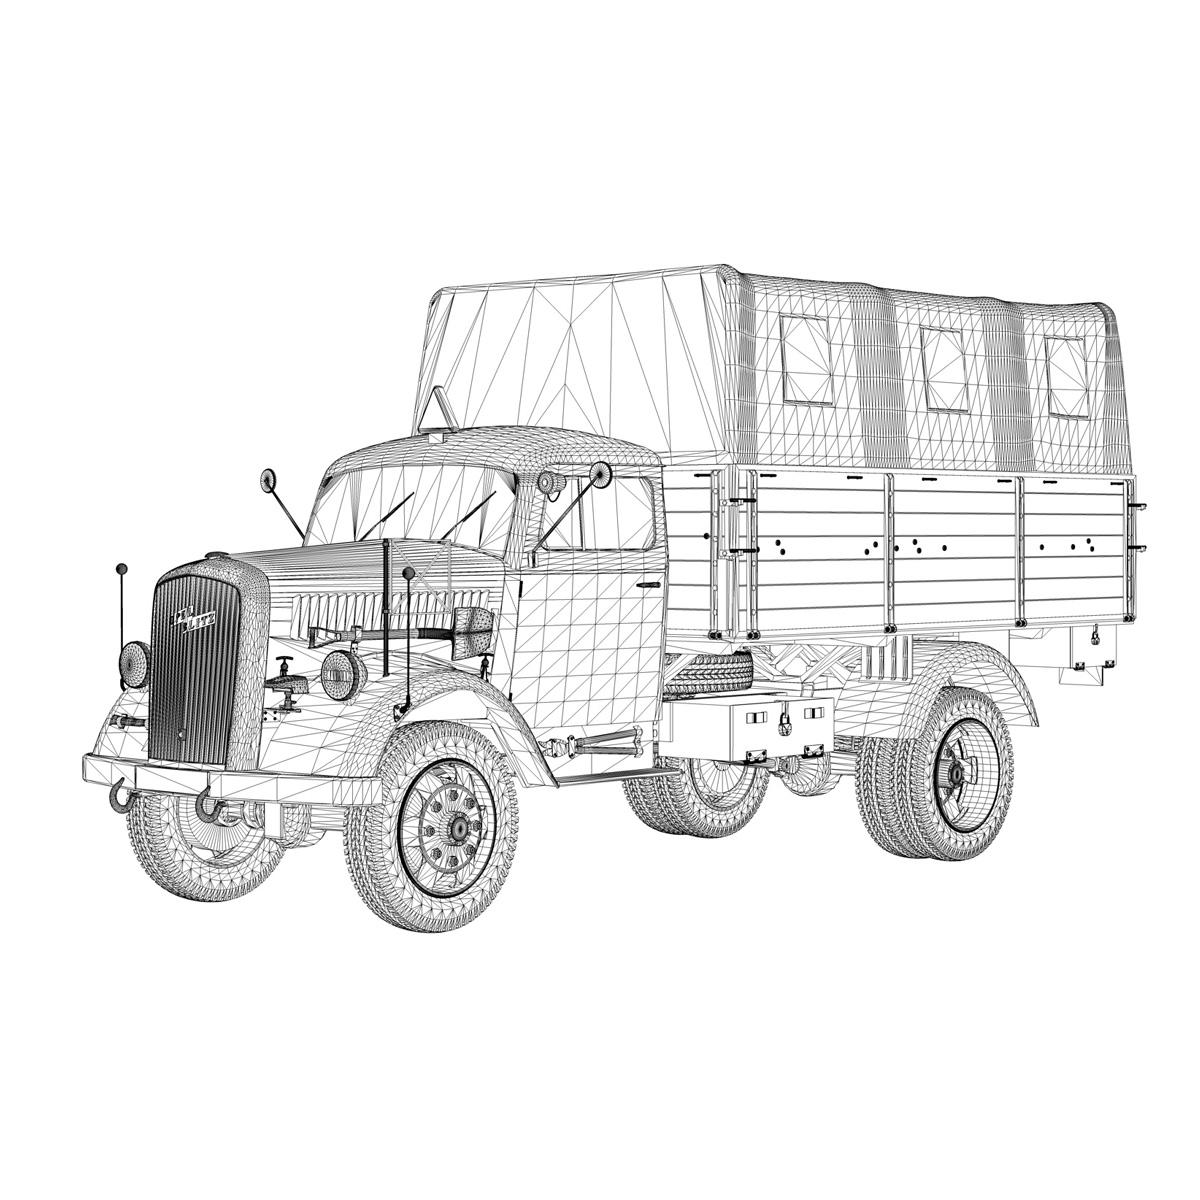 blitz opel - lori cargo 3t - 17 pzdiv model 3d 3ds fbx c4d lwo obj 197205